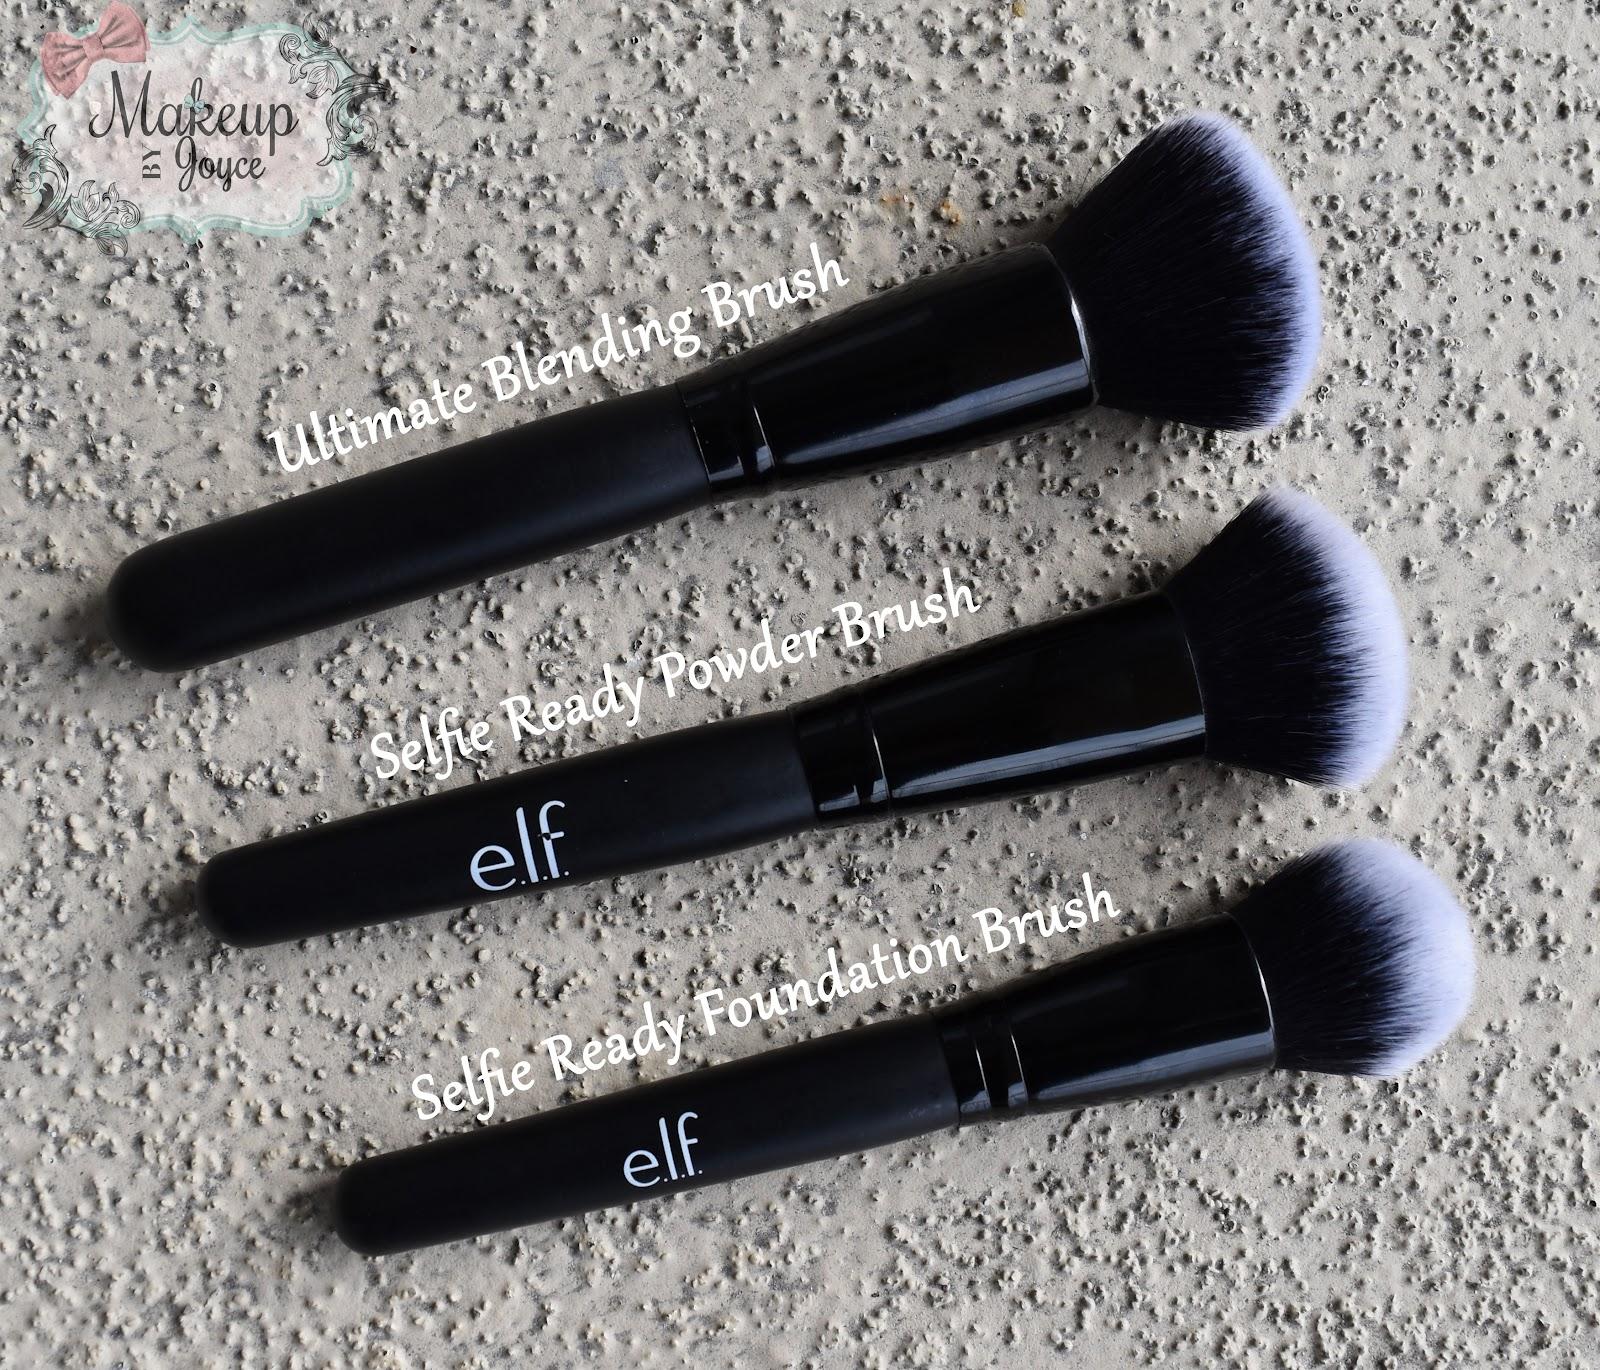 elf brushes : Target